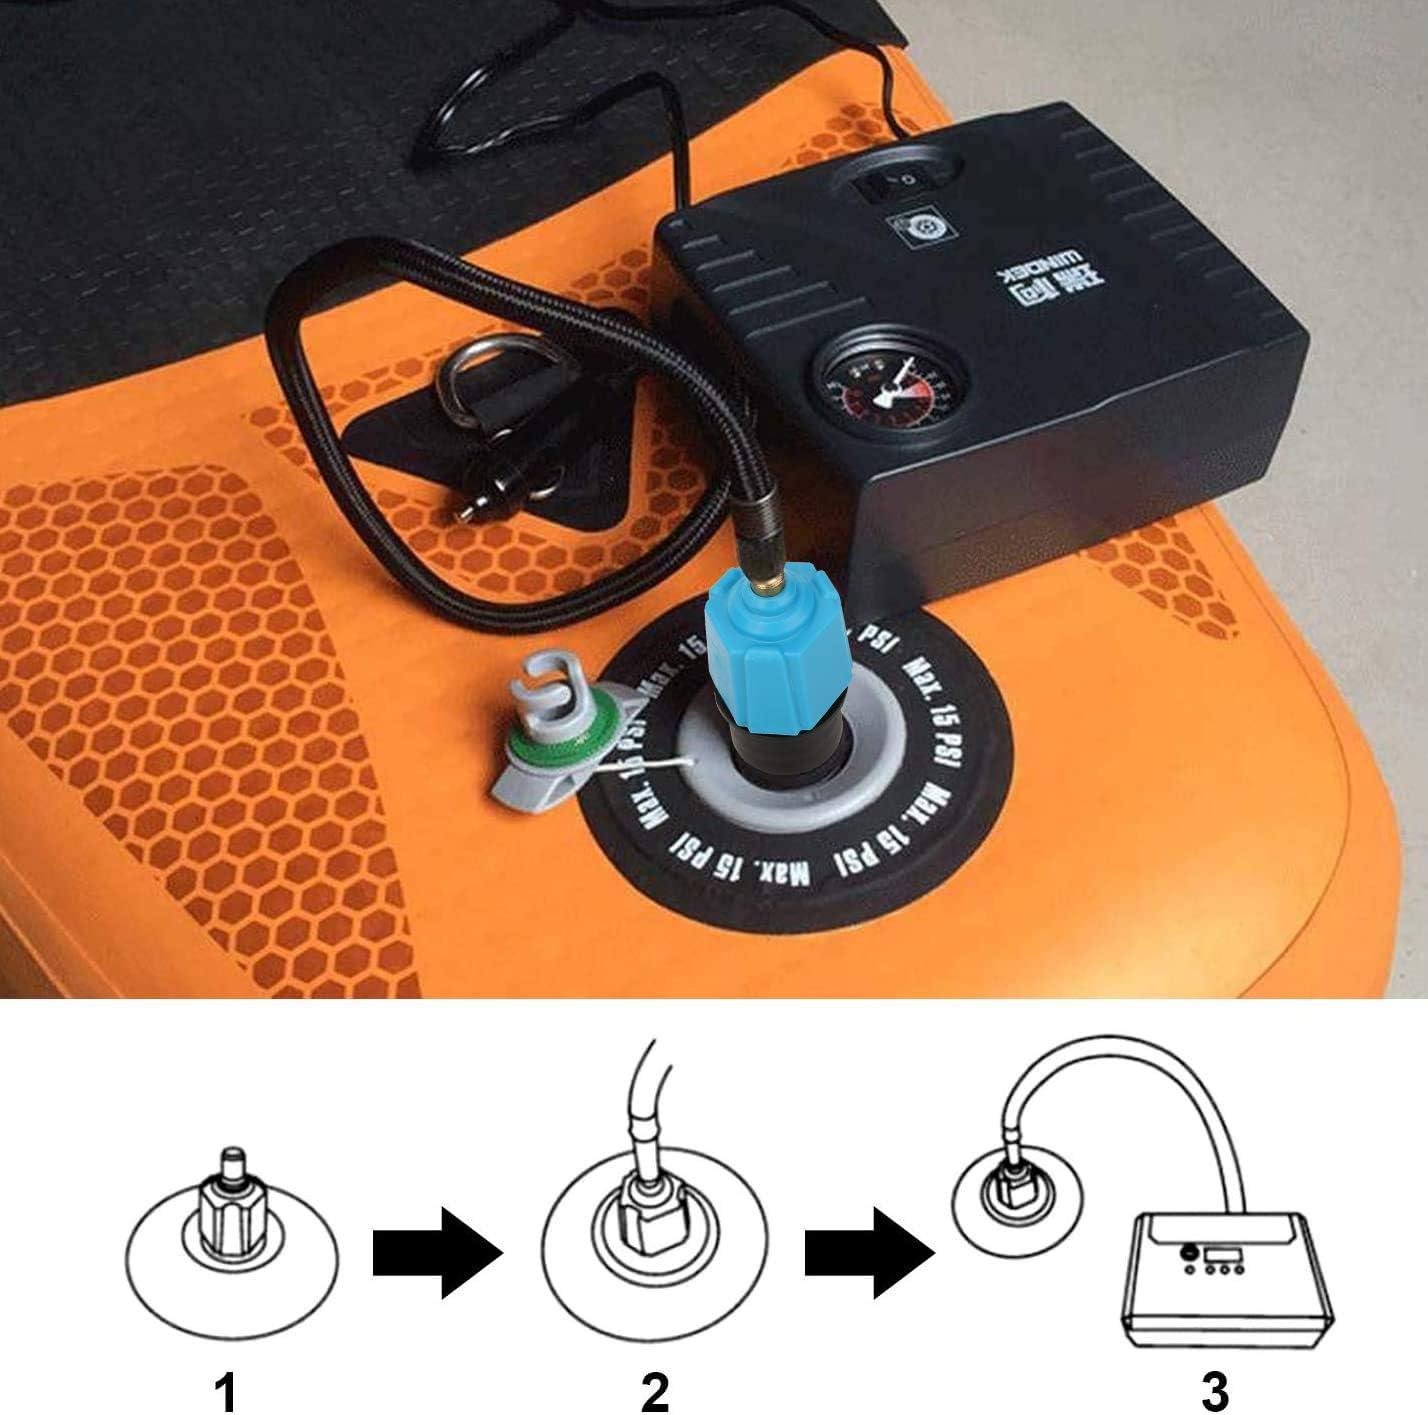 QKURT Adaptador de Bomba de Sup Inflable Convertidor de Bomba de Aire Adaptador de v/álvula de Sup multifunci/ón con 4 boquillas de v/álvula de Aire para Bote Inflable etc. Tabla de Paddle de pie